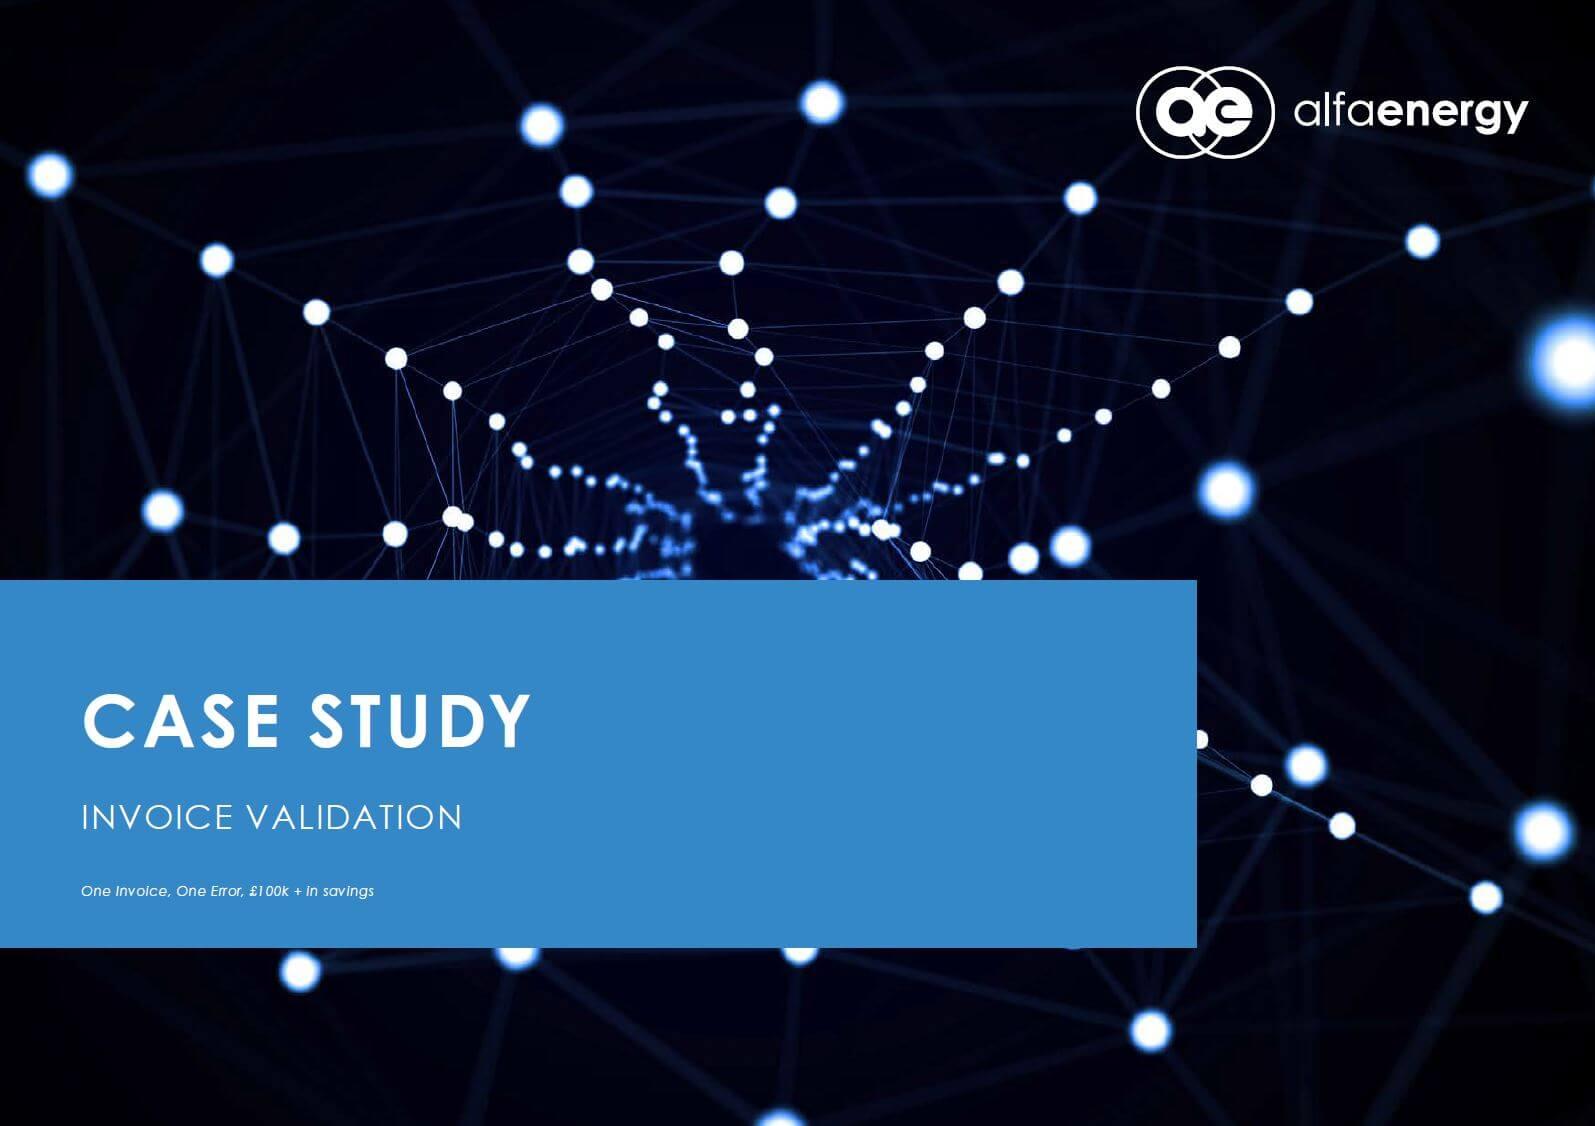 CaseStudy-InvoiceValidation